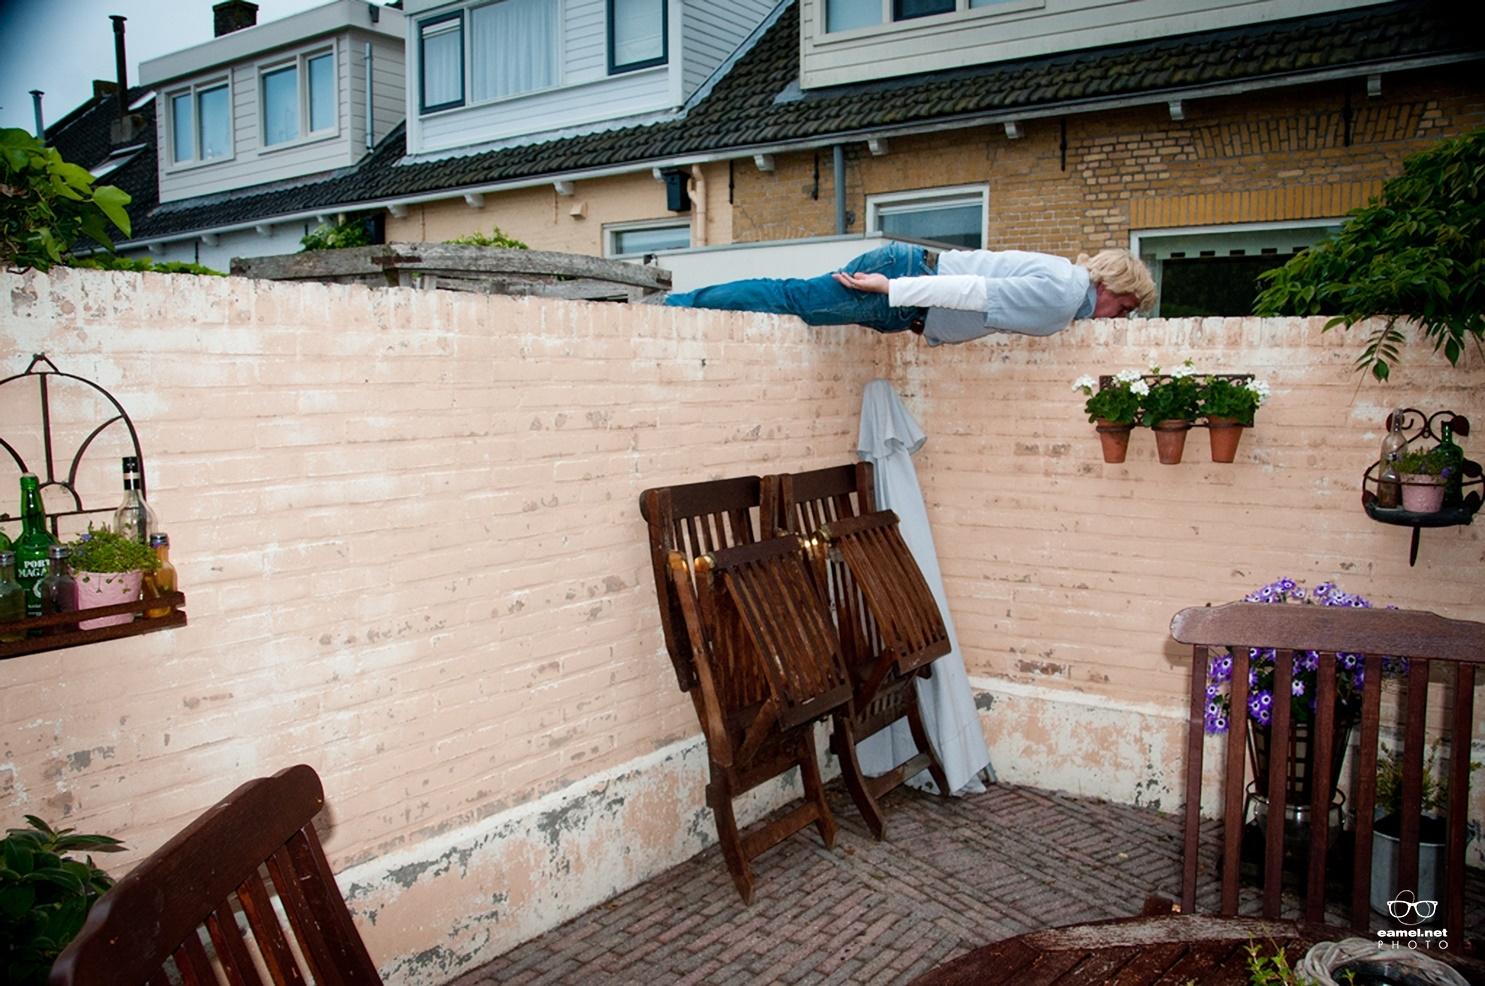 planking grut2 - Zoek de plank